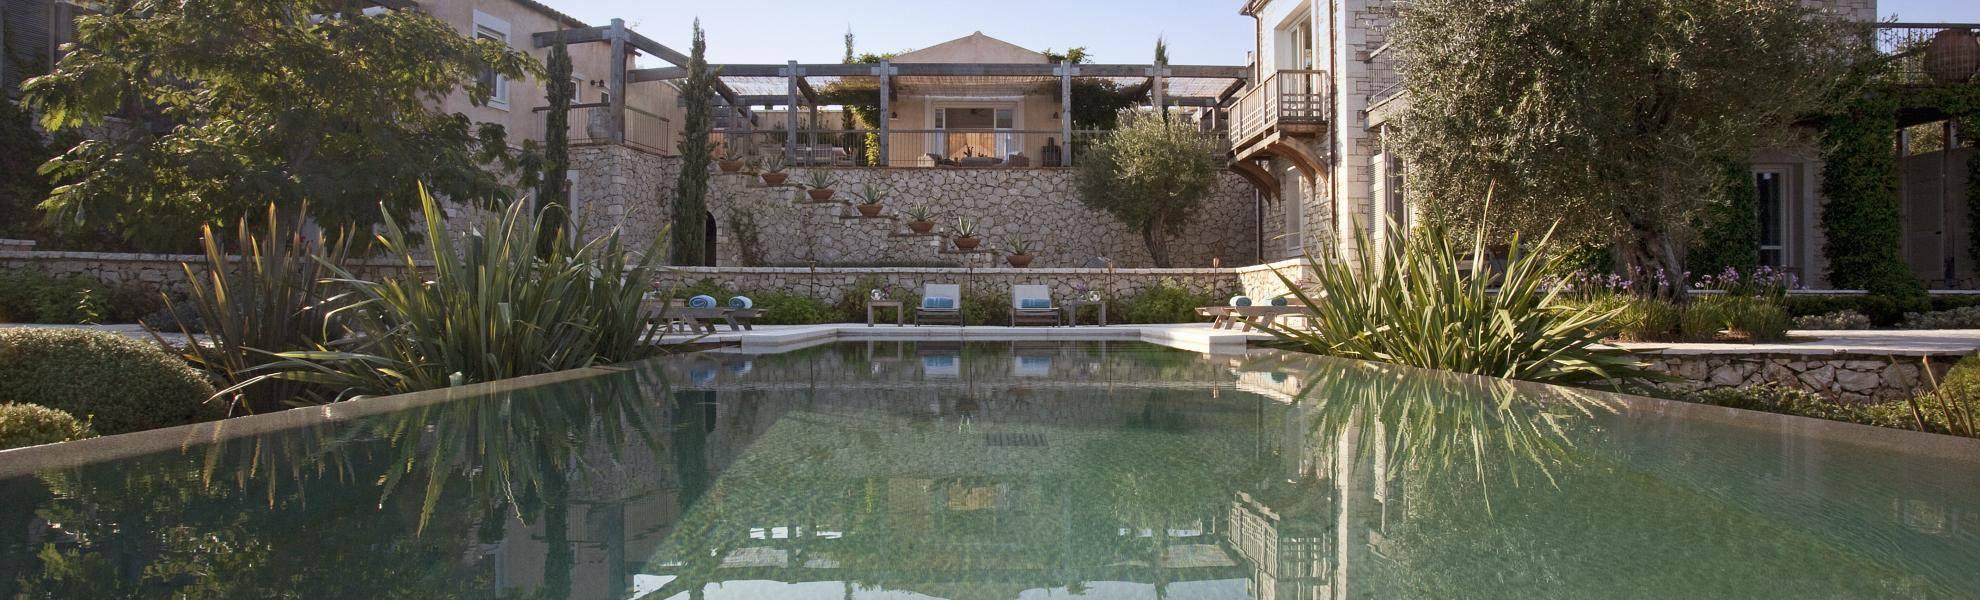 Villa Polyhymnia